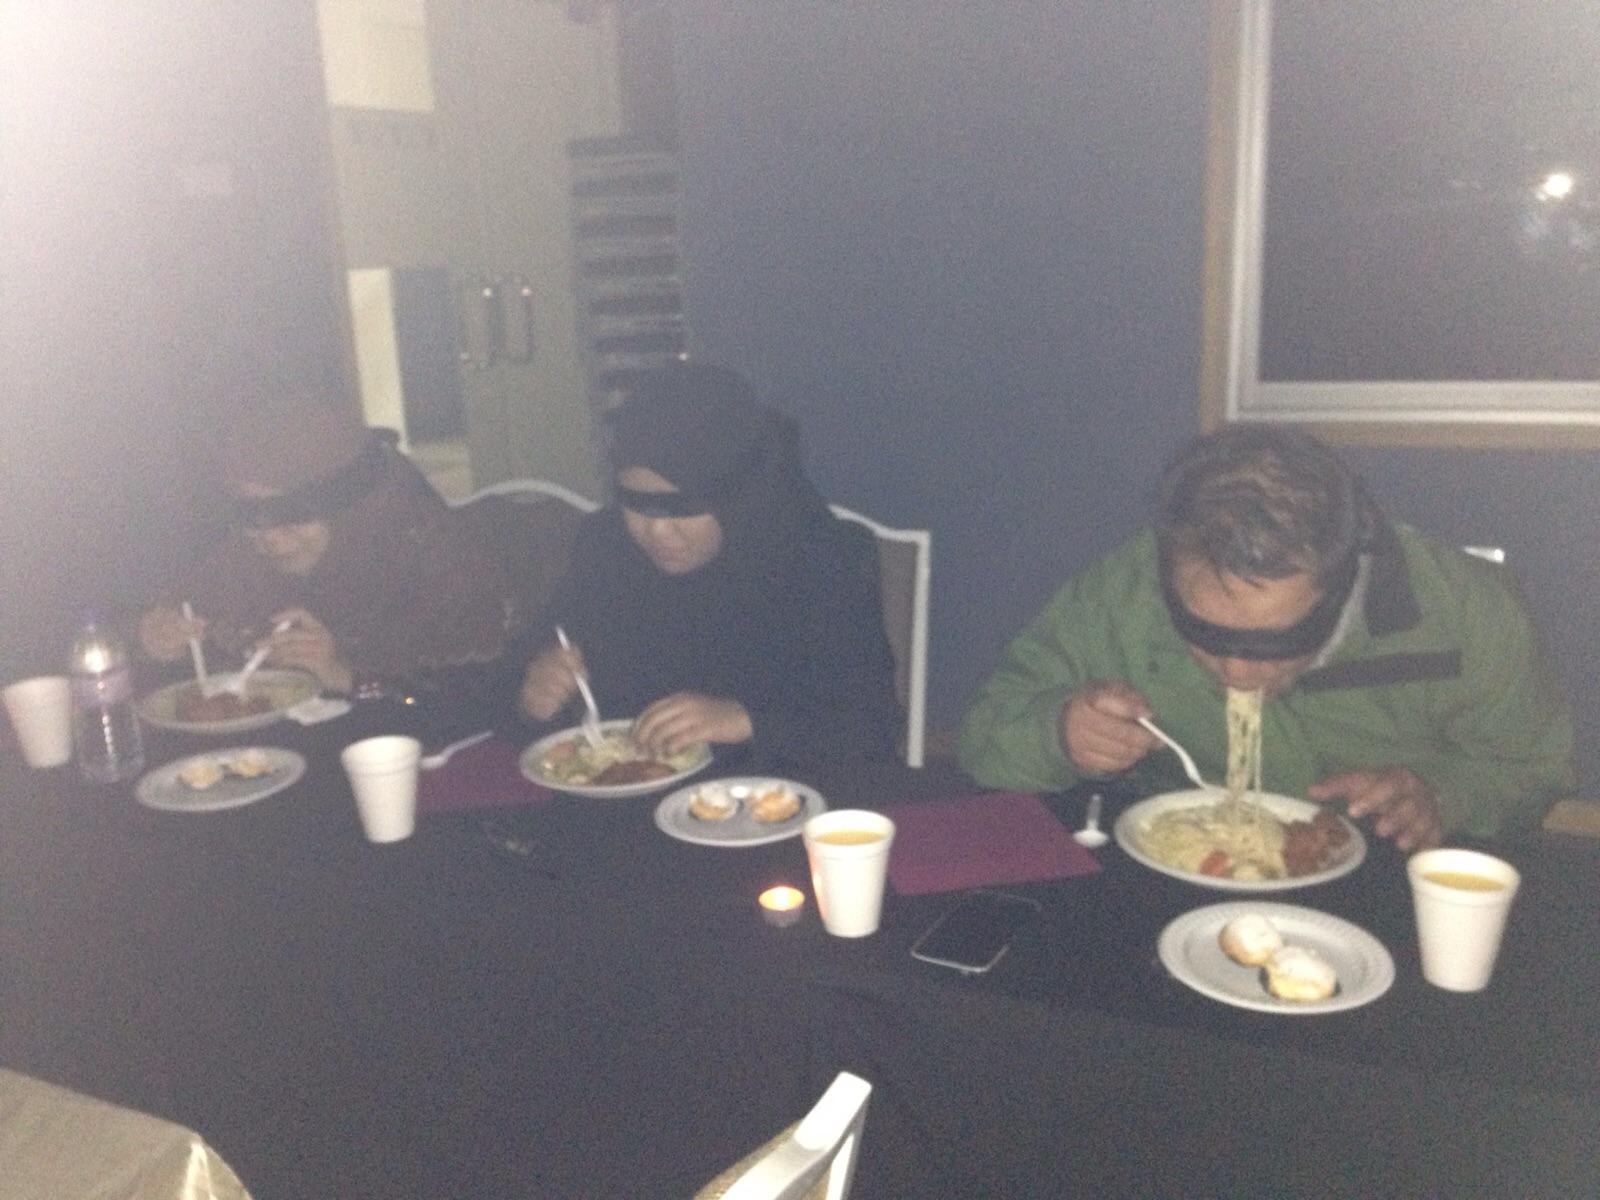 dans le noir dining in the dark 5